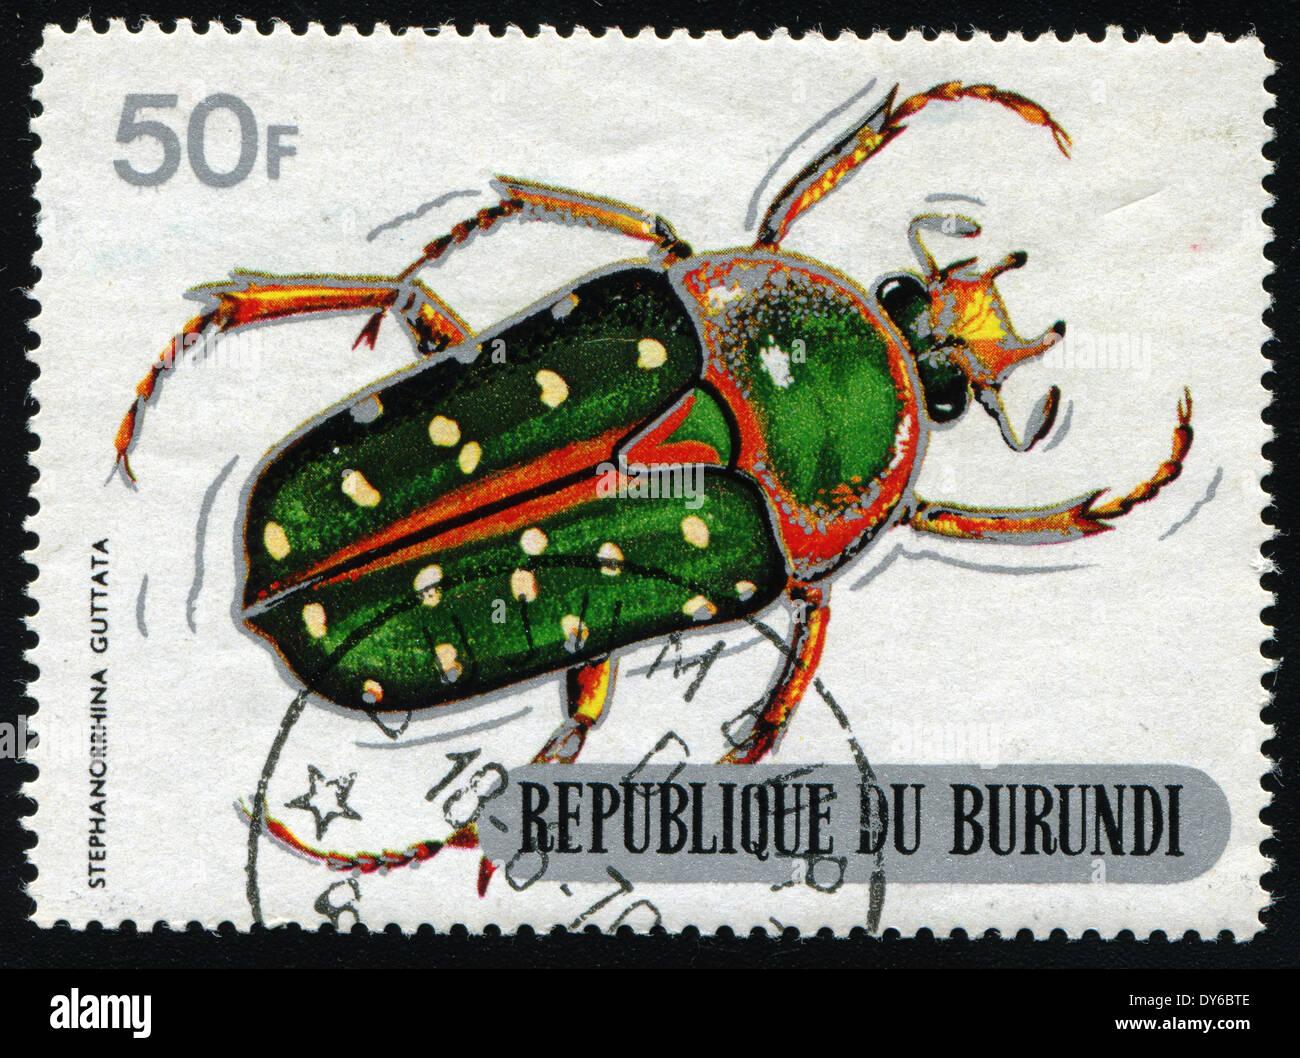 REPUBLIC OF BURUNDI - CIRCA 1970:printed in Republic of Burundi shows shows beetle (STEPHANORRHINA GUTTATA), circa Stock Photo